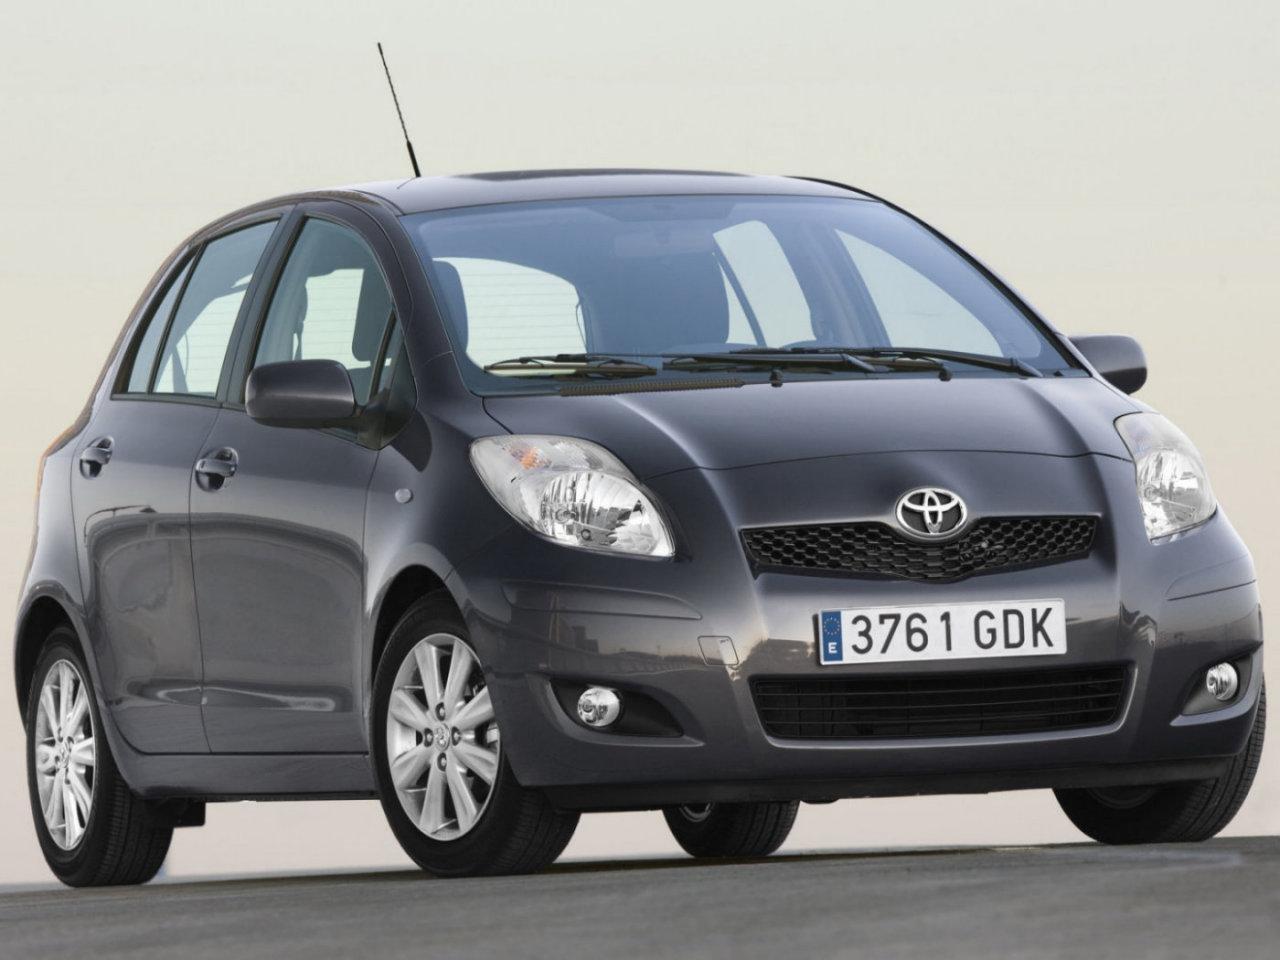 Toyota Yaris 1.3 2SZ-FE Denso 89663-0D131